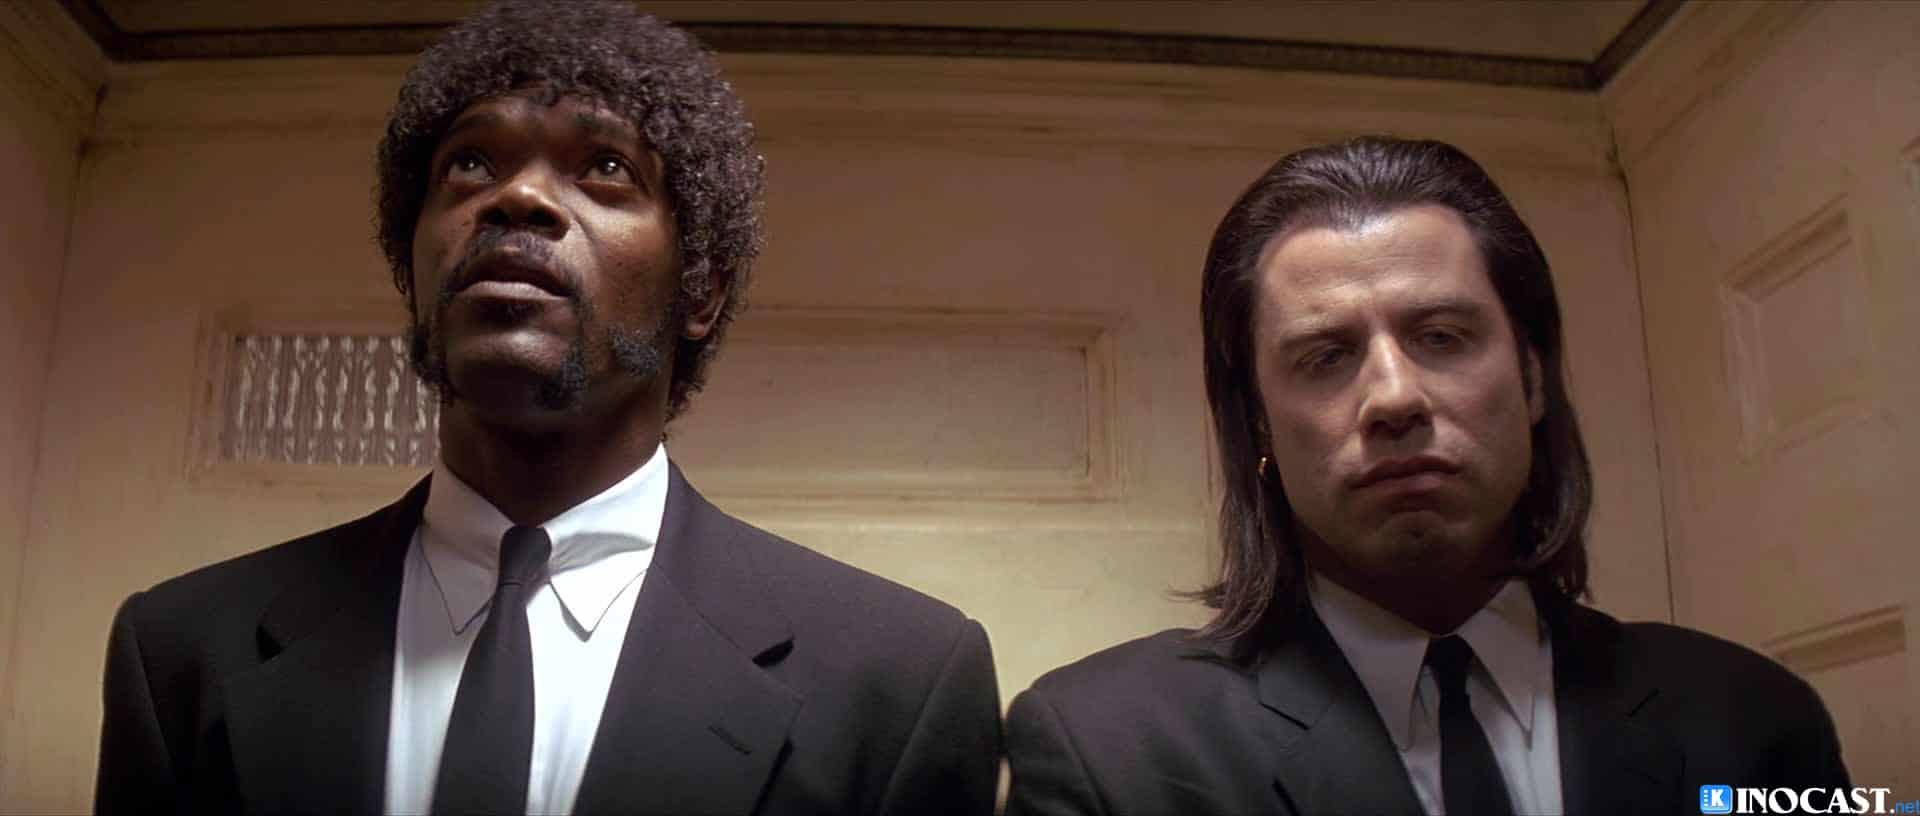 Pulp Fiction Samuel L Jackson John Travolta Elevator Scene